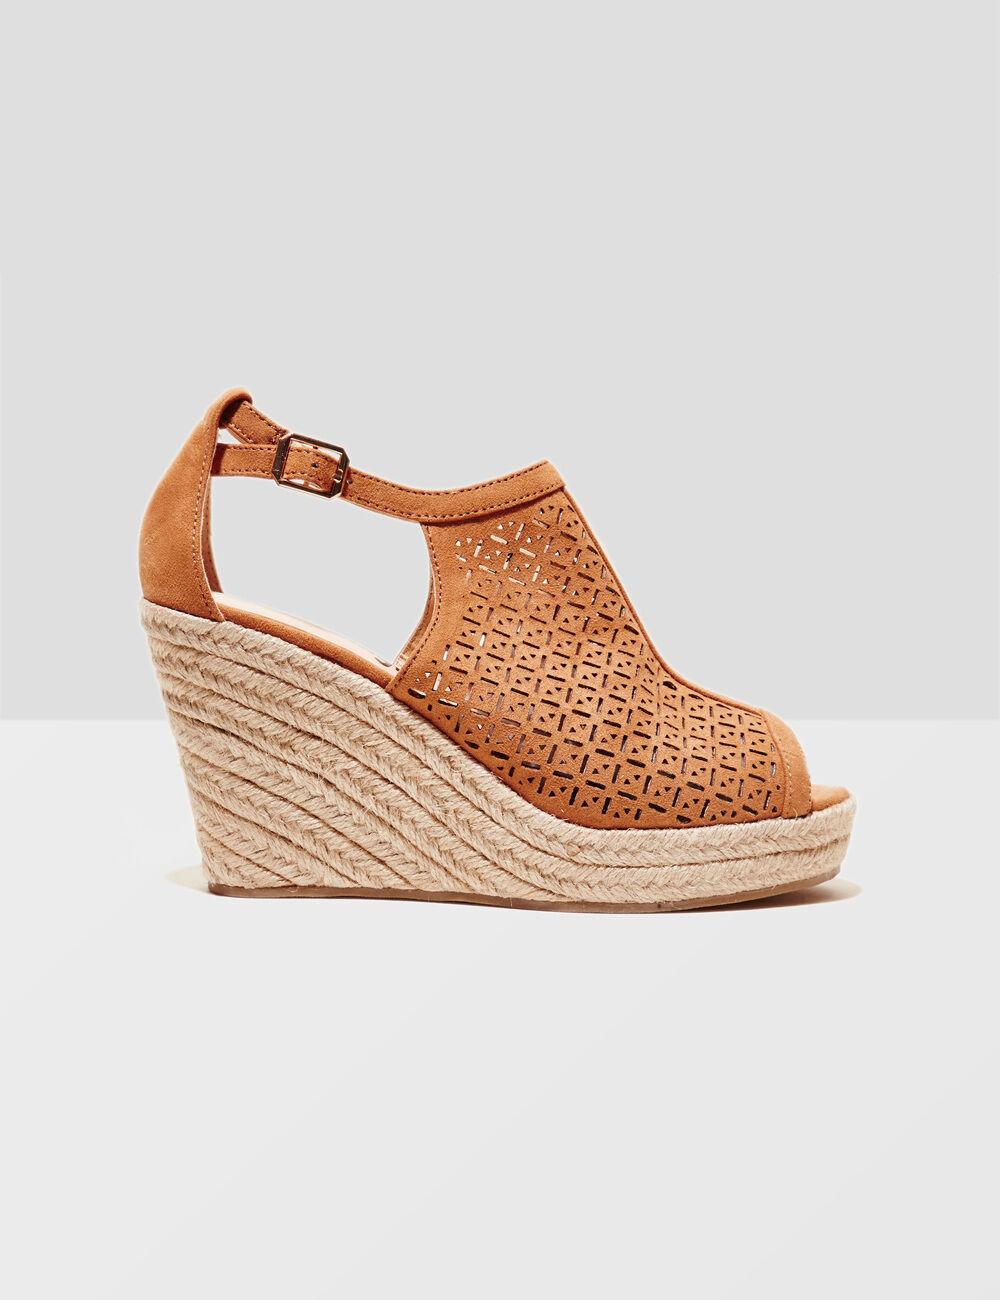 e Clothing promozione Vendita Teenage Sandals Jennyfer vw6WBWxn